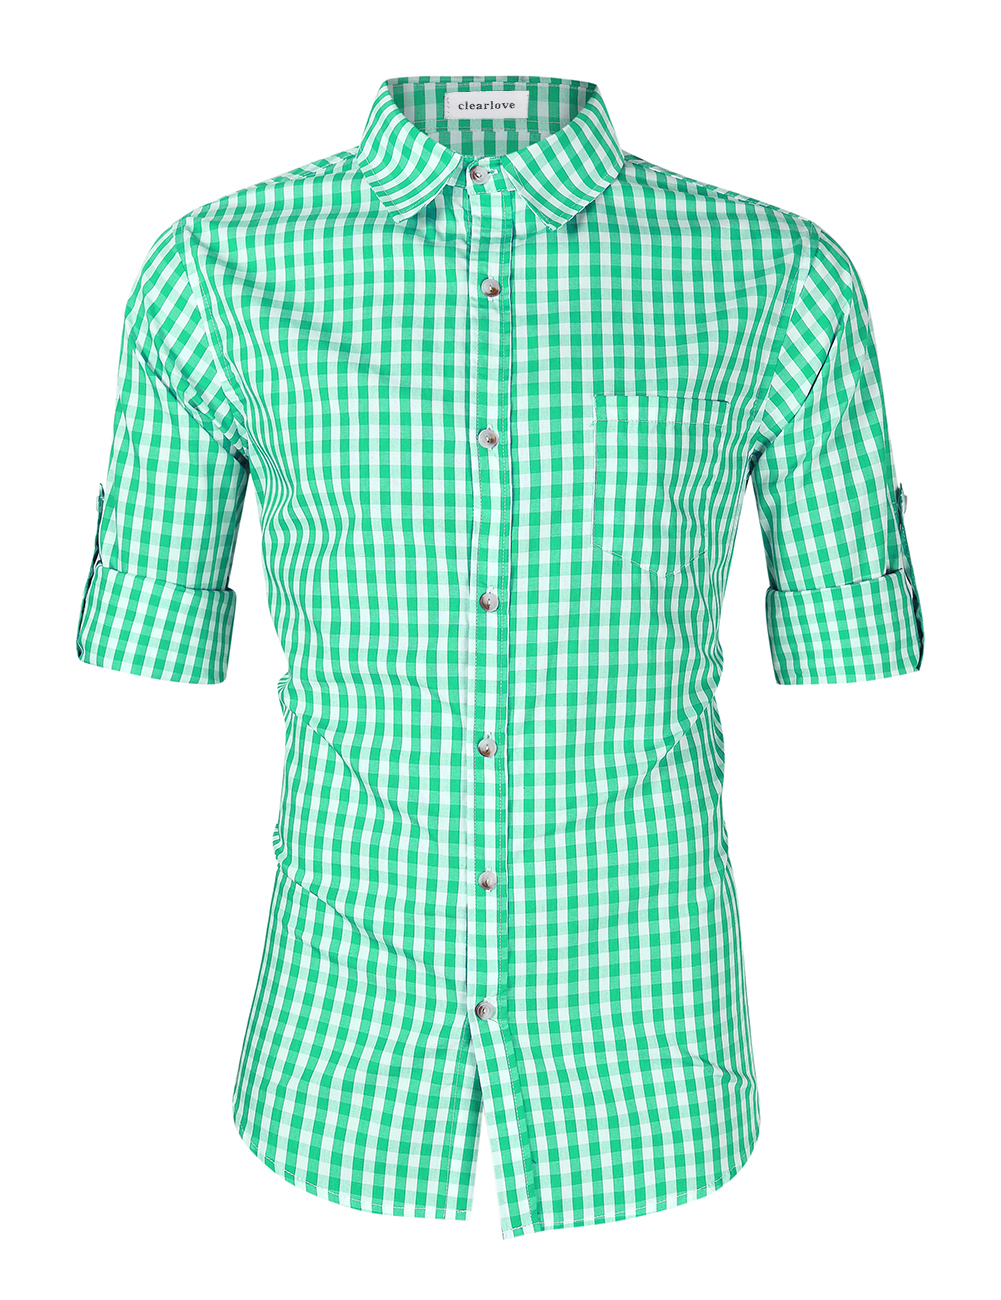 [EU Direct] Clearlove Men's Oktoberfest Stylish Plaid Long Sleeve Slim Fit Classical Shirt for Oktoberfest Costumes